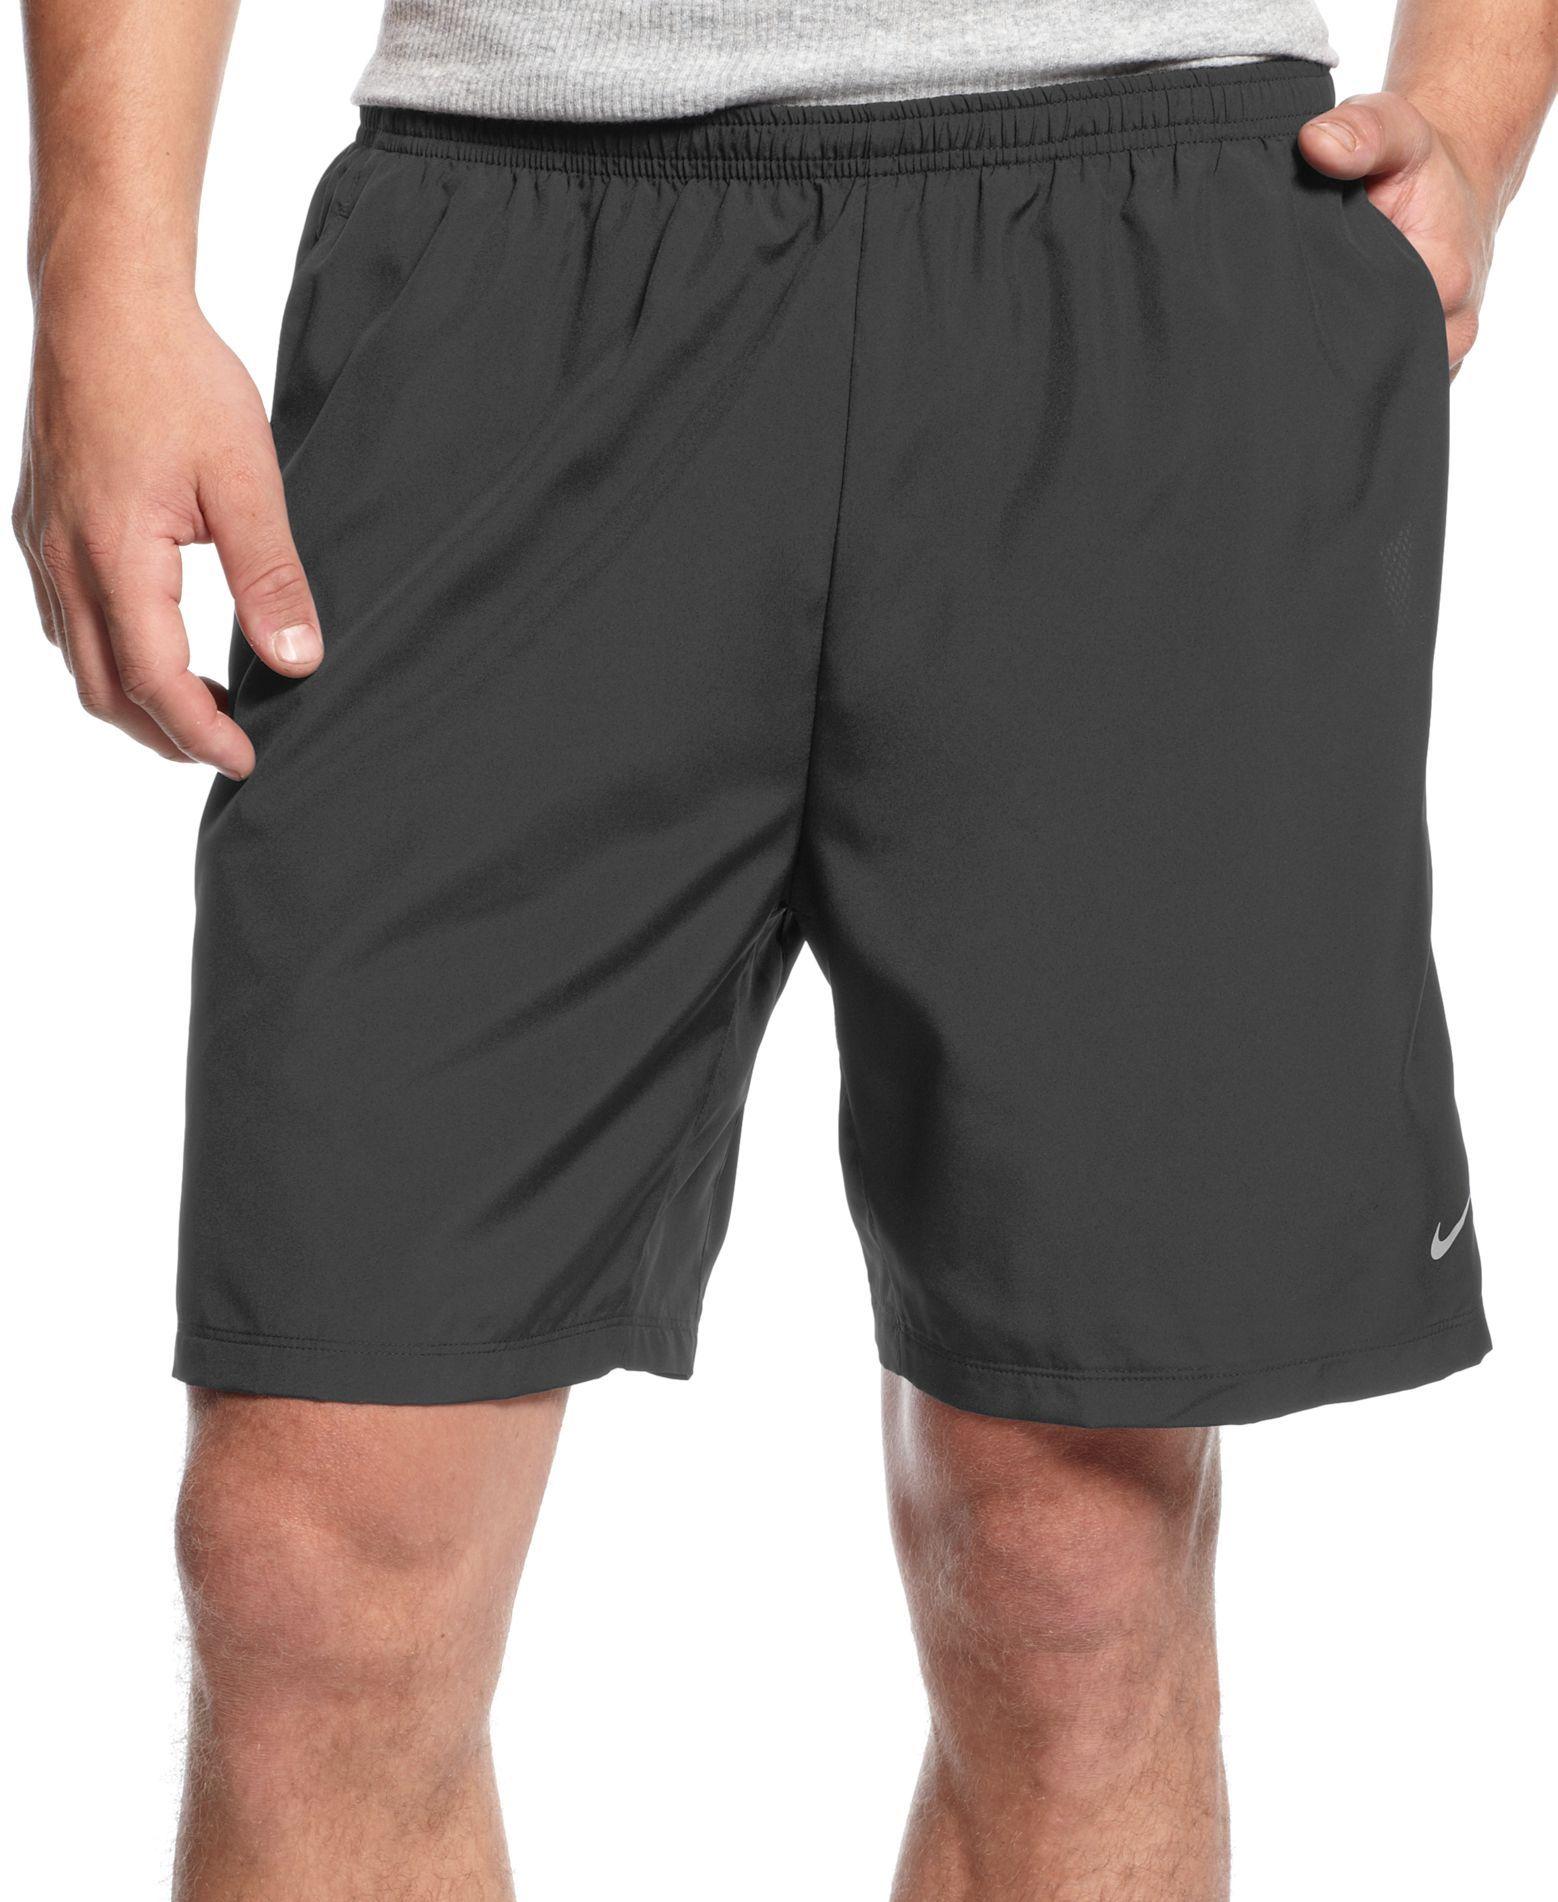 online store 9c4df 9eaec Nike Shorts, Dri-fit 7